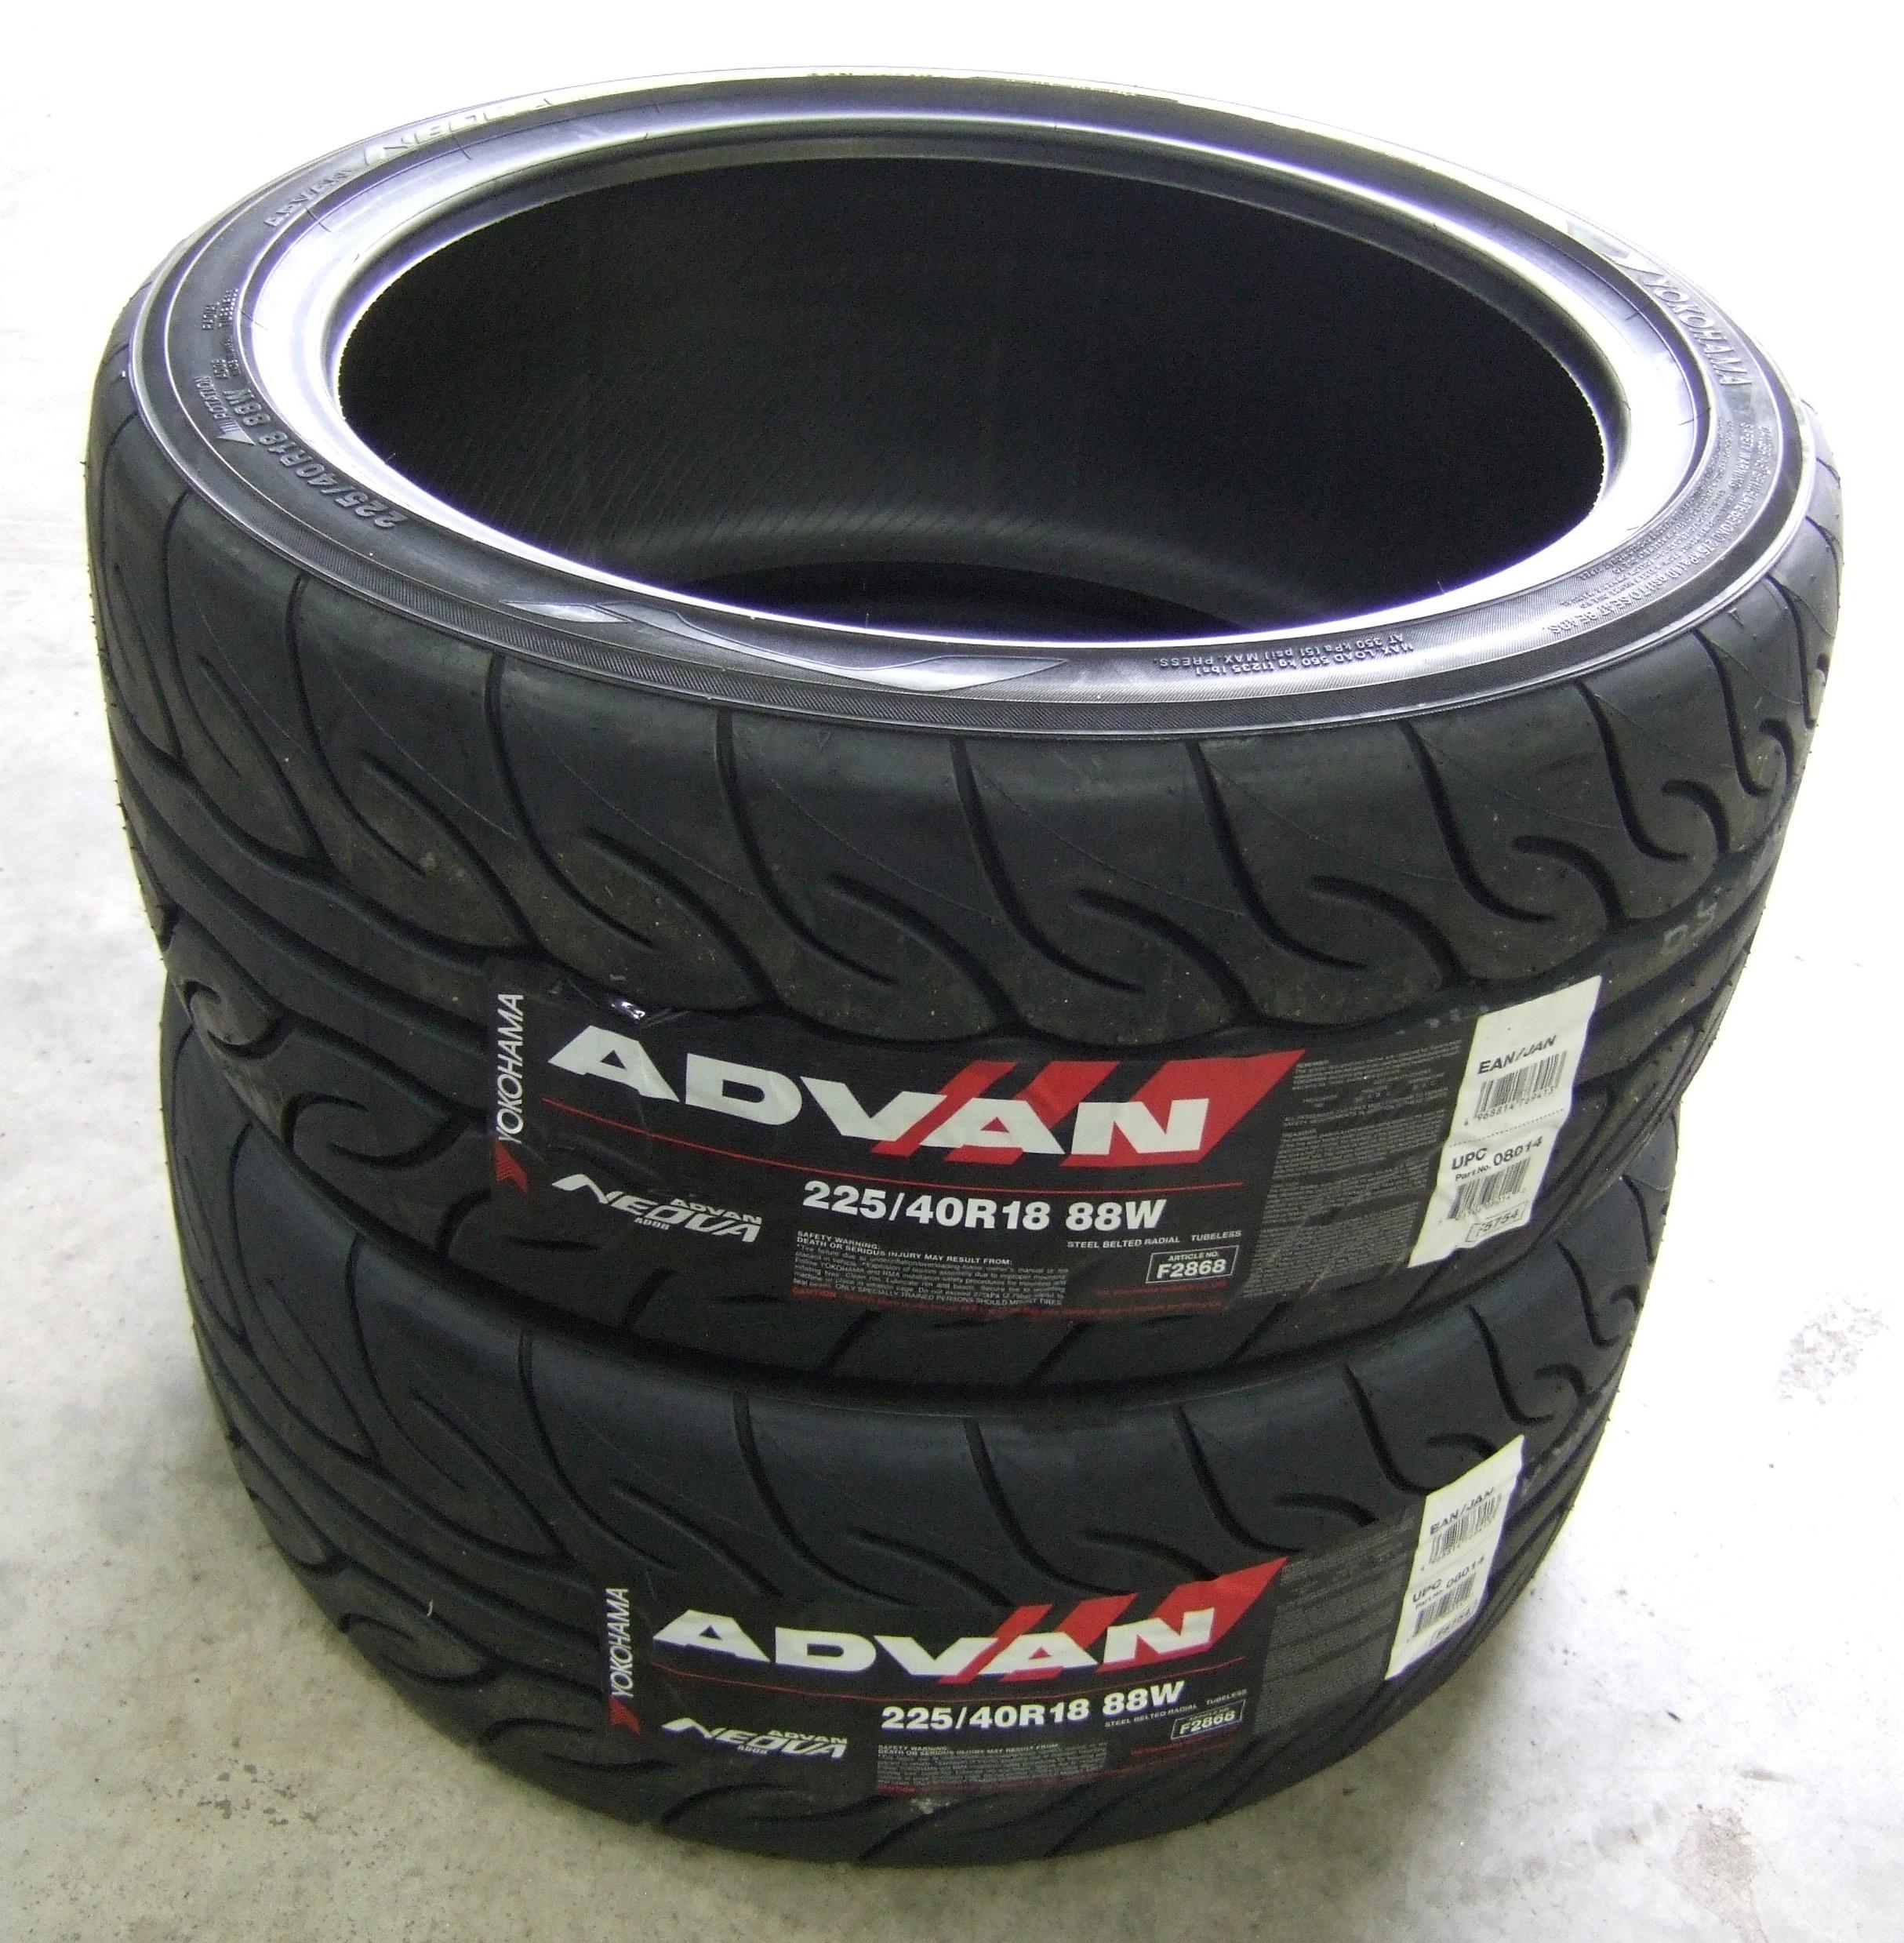 225 40 18 yokohama ad08 advan neova track day tyres 2254018 88w 225 40 18 x2 ebay. Black Bedroom Furniture Sets. Home Design Ideas